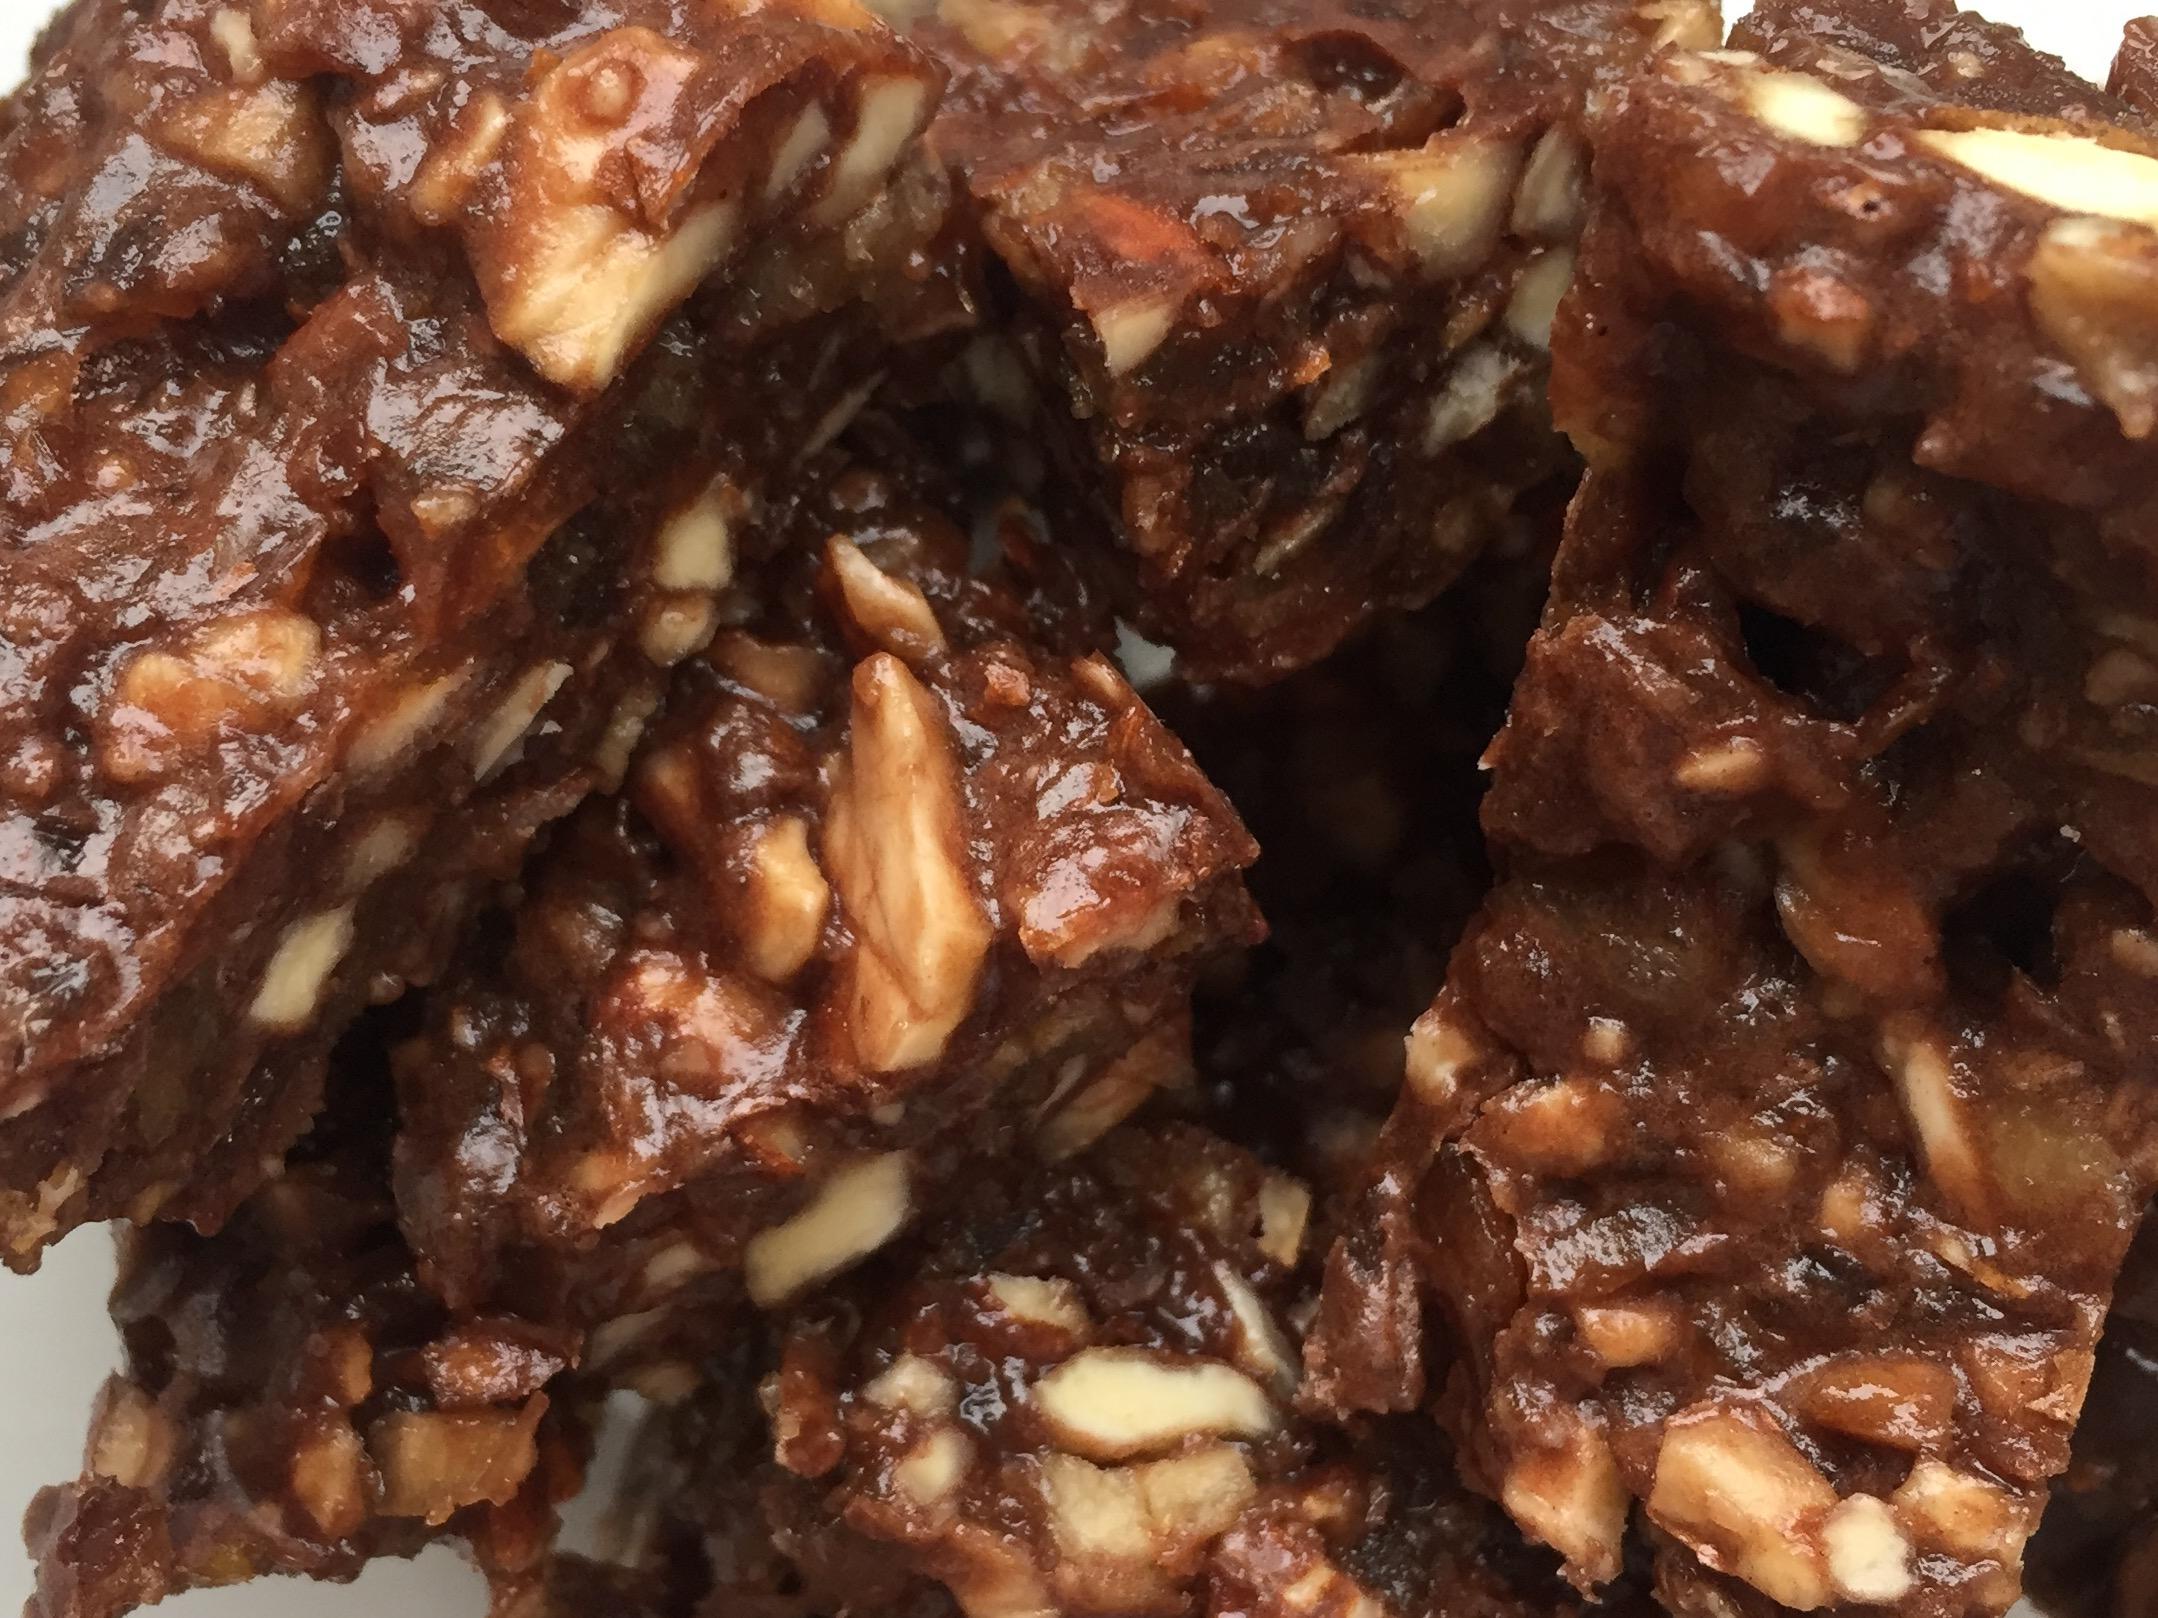 Chocolate Almond Fudge Bites